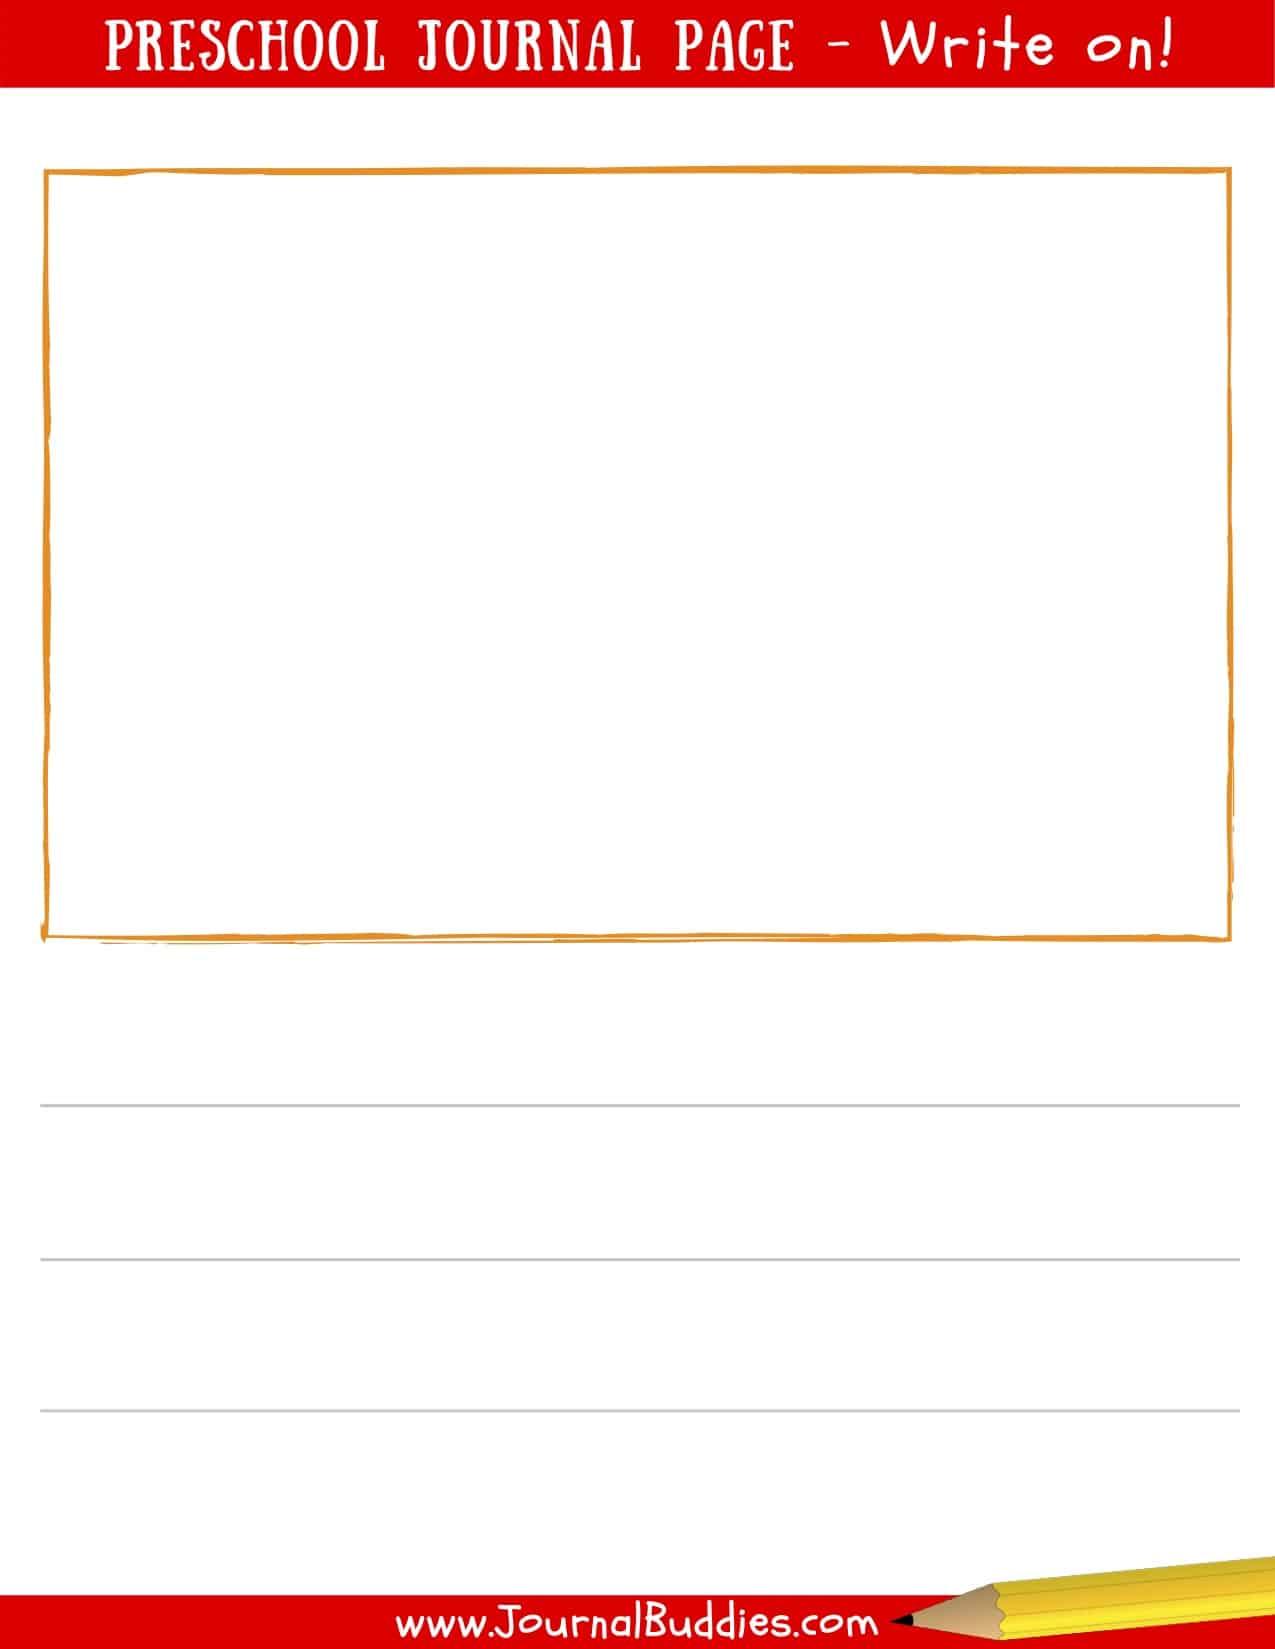 Preschool printable journal page